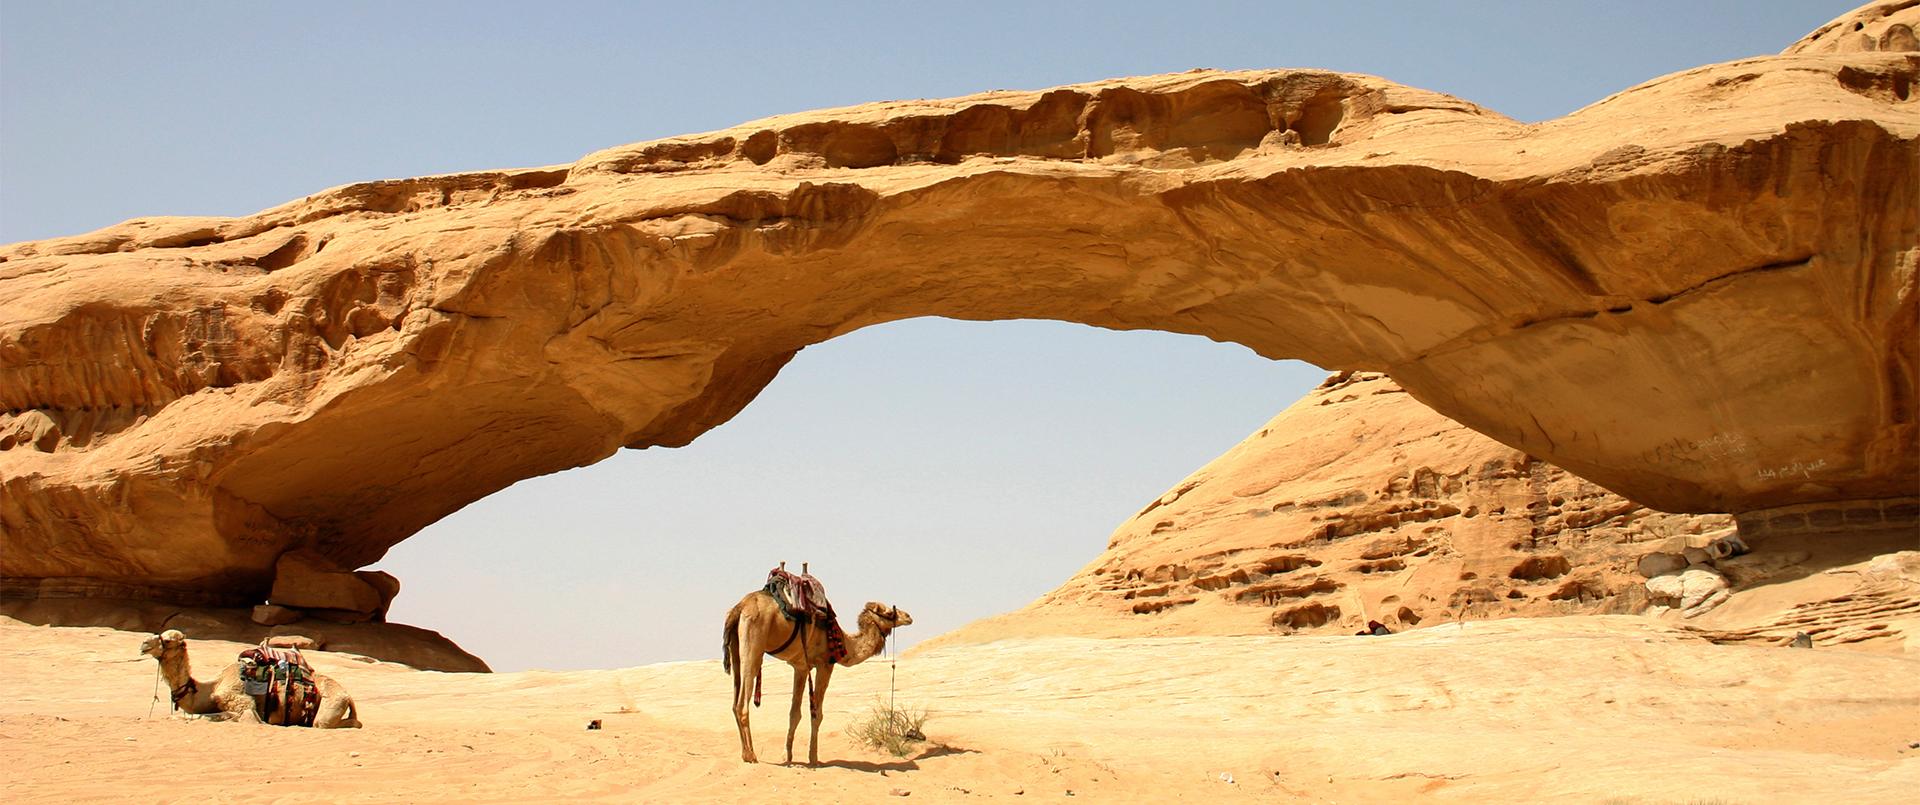 The Kingdom of Jordan